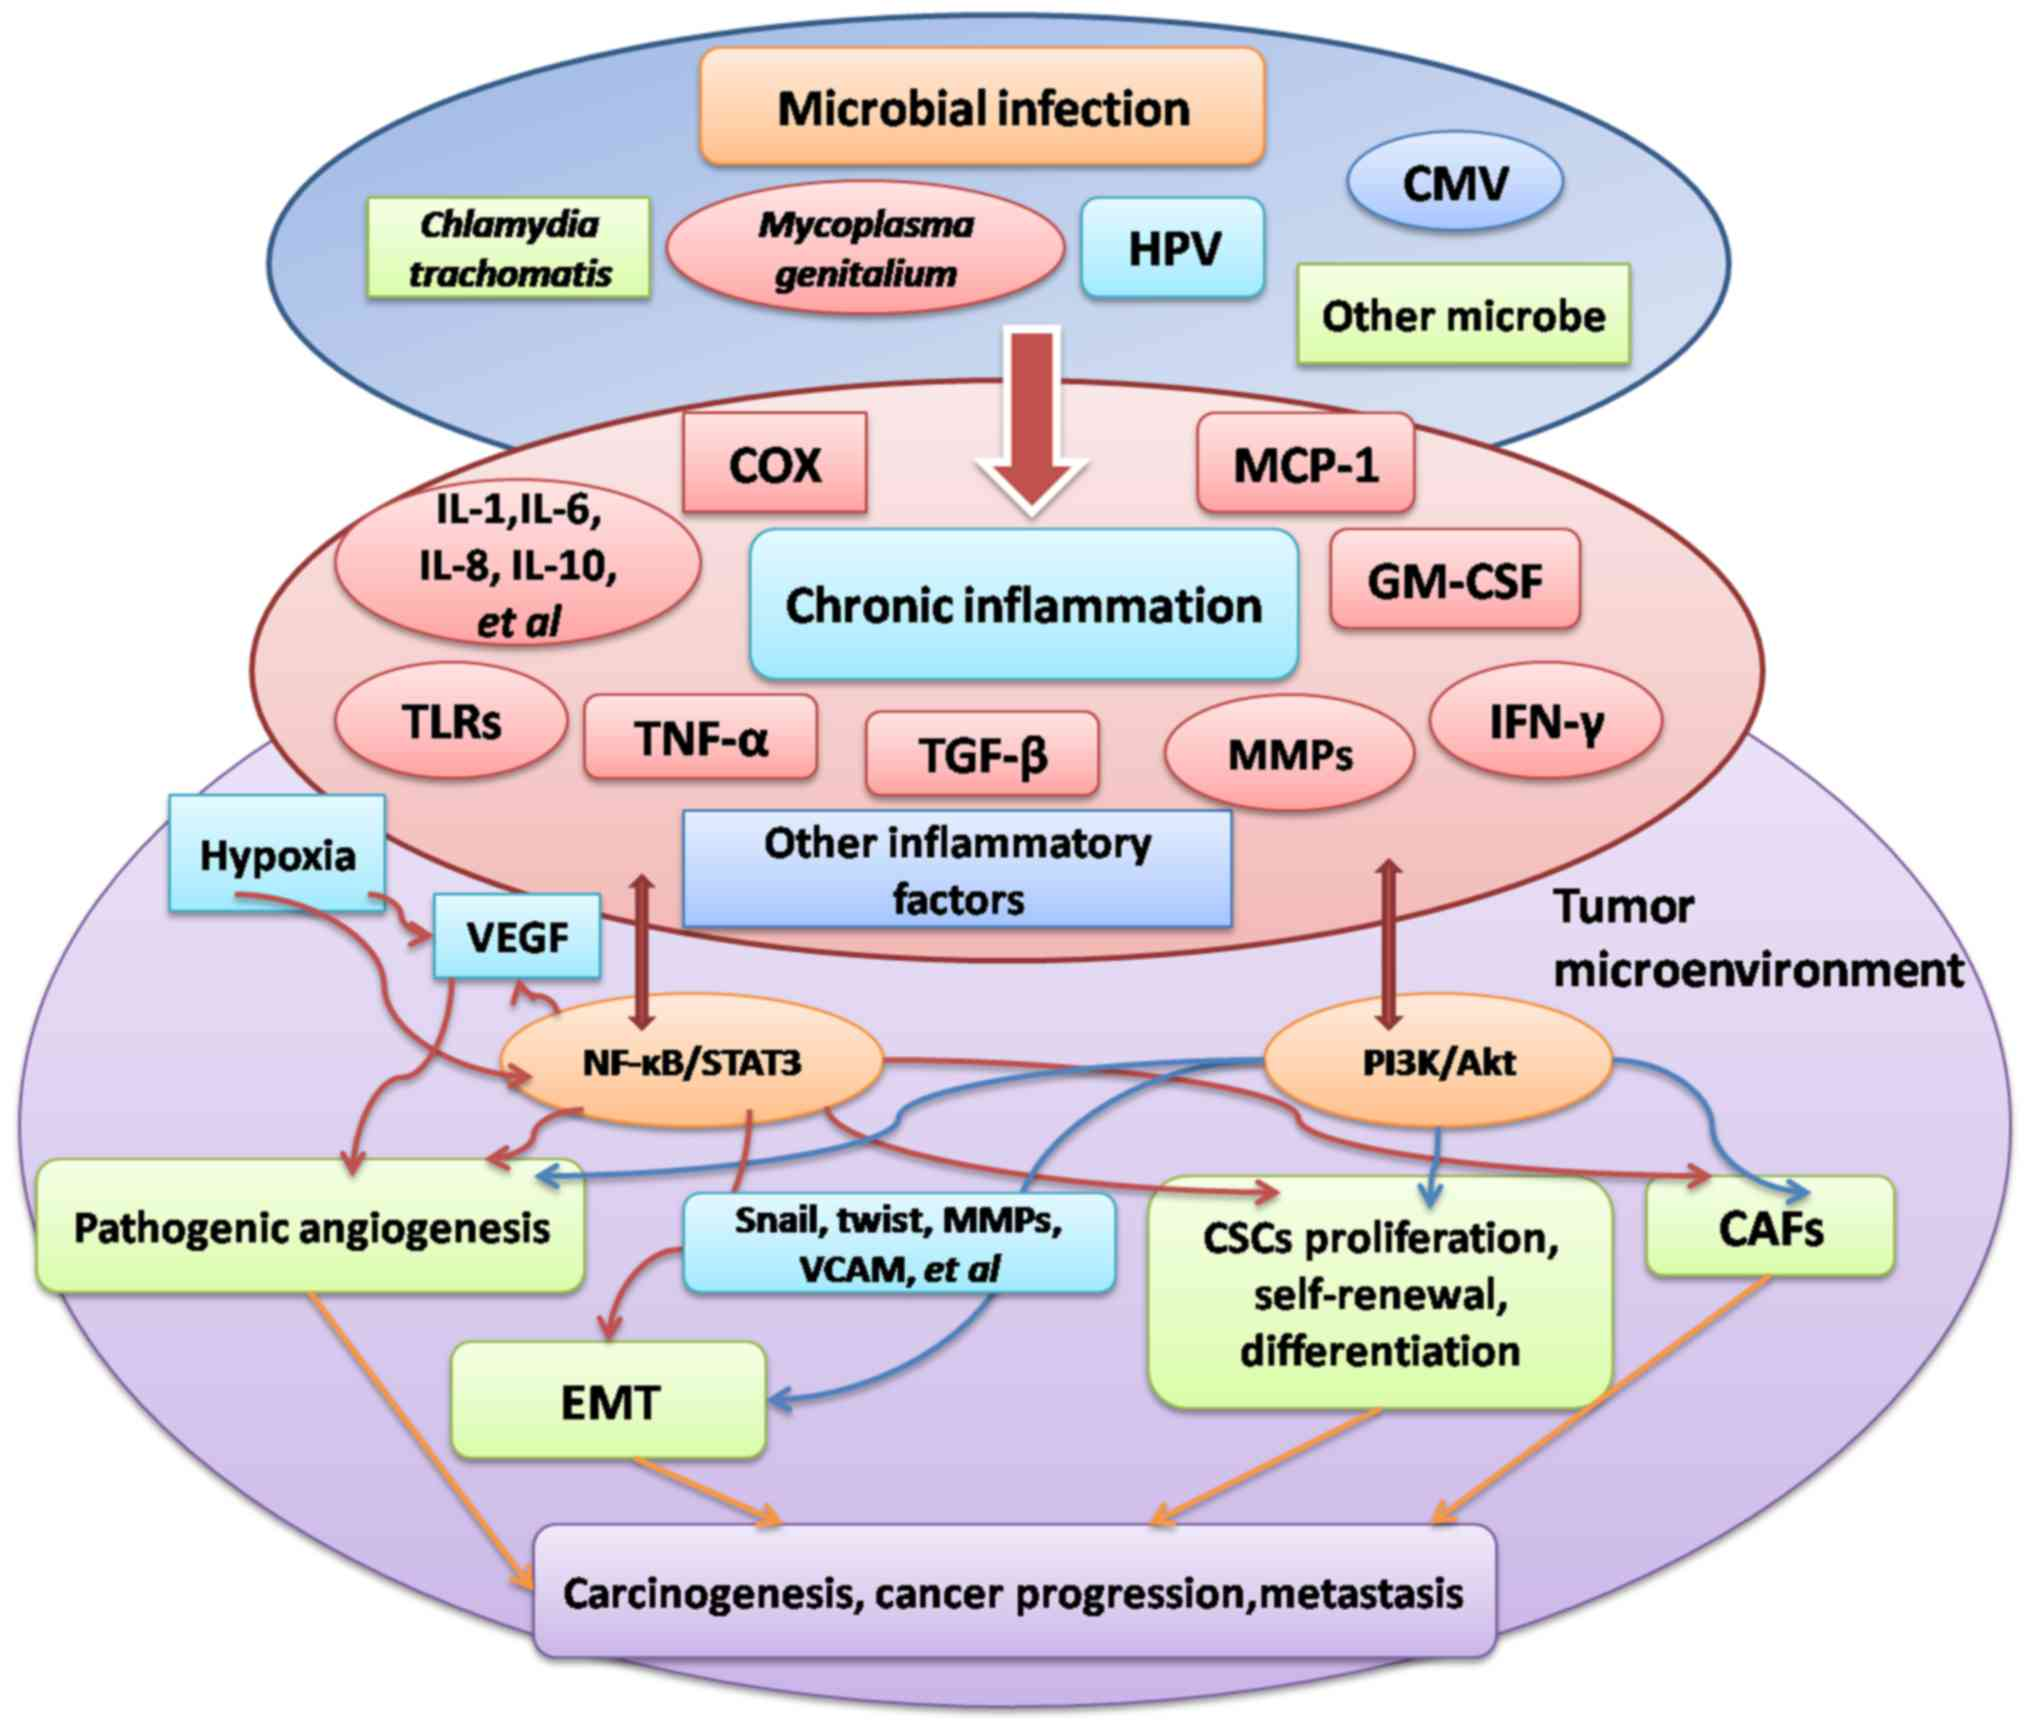 hpv positive ovarian cancer